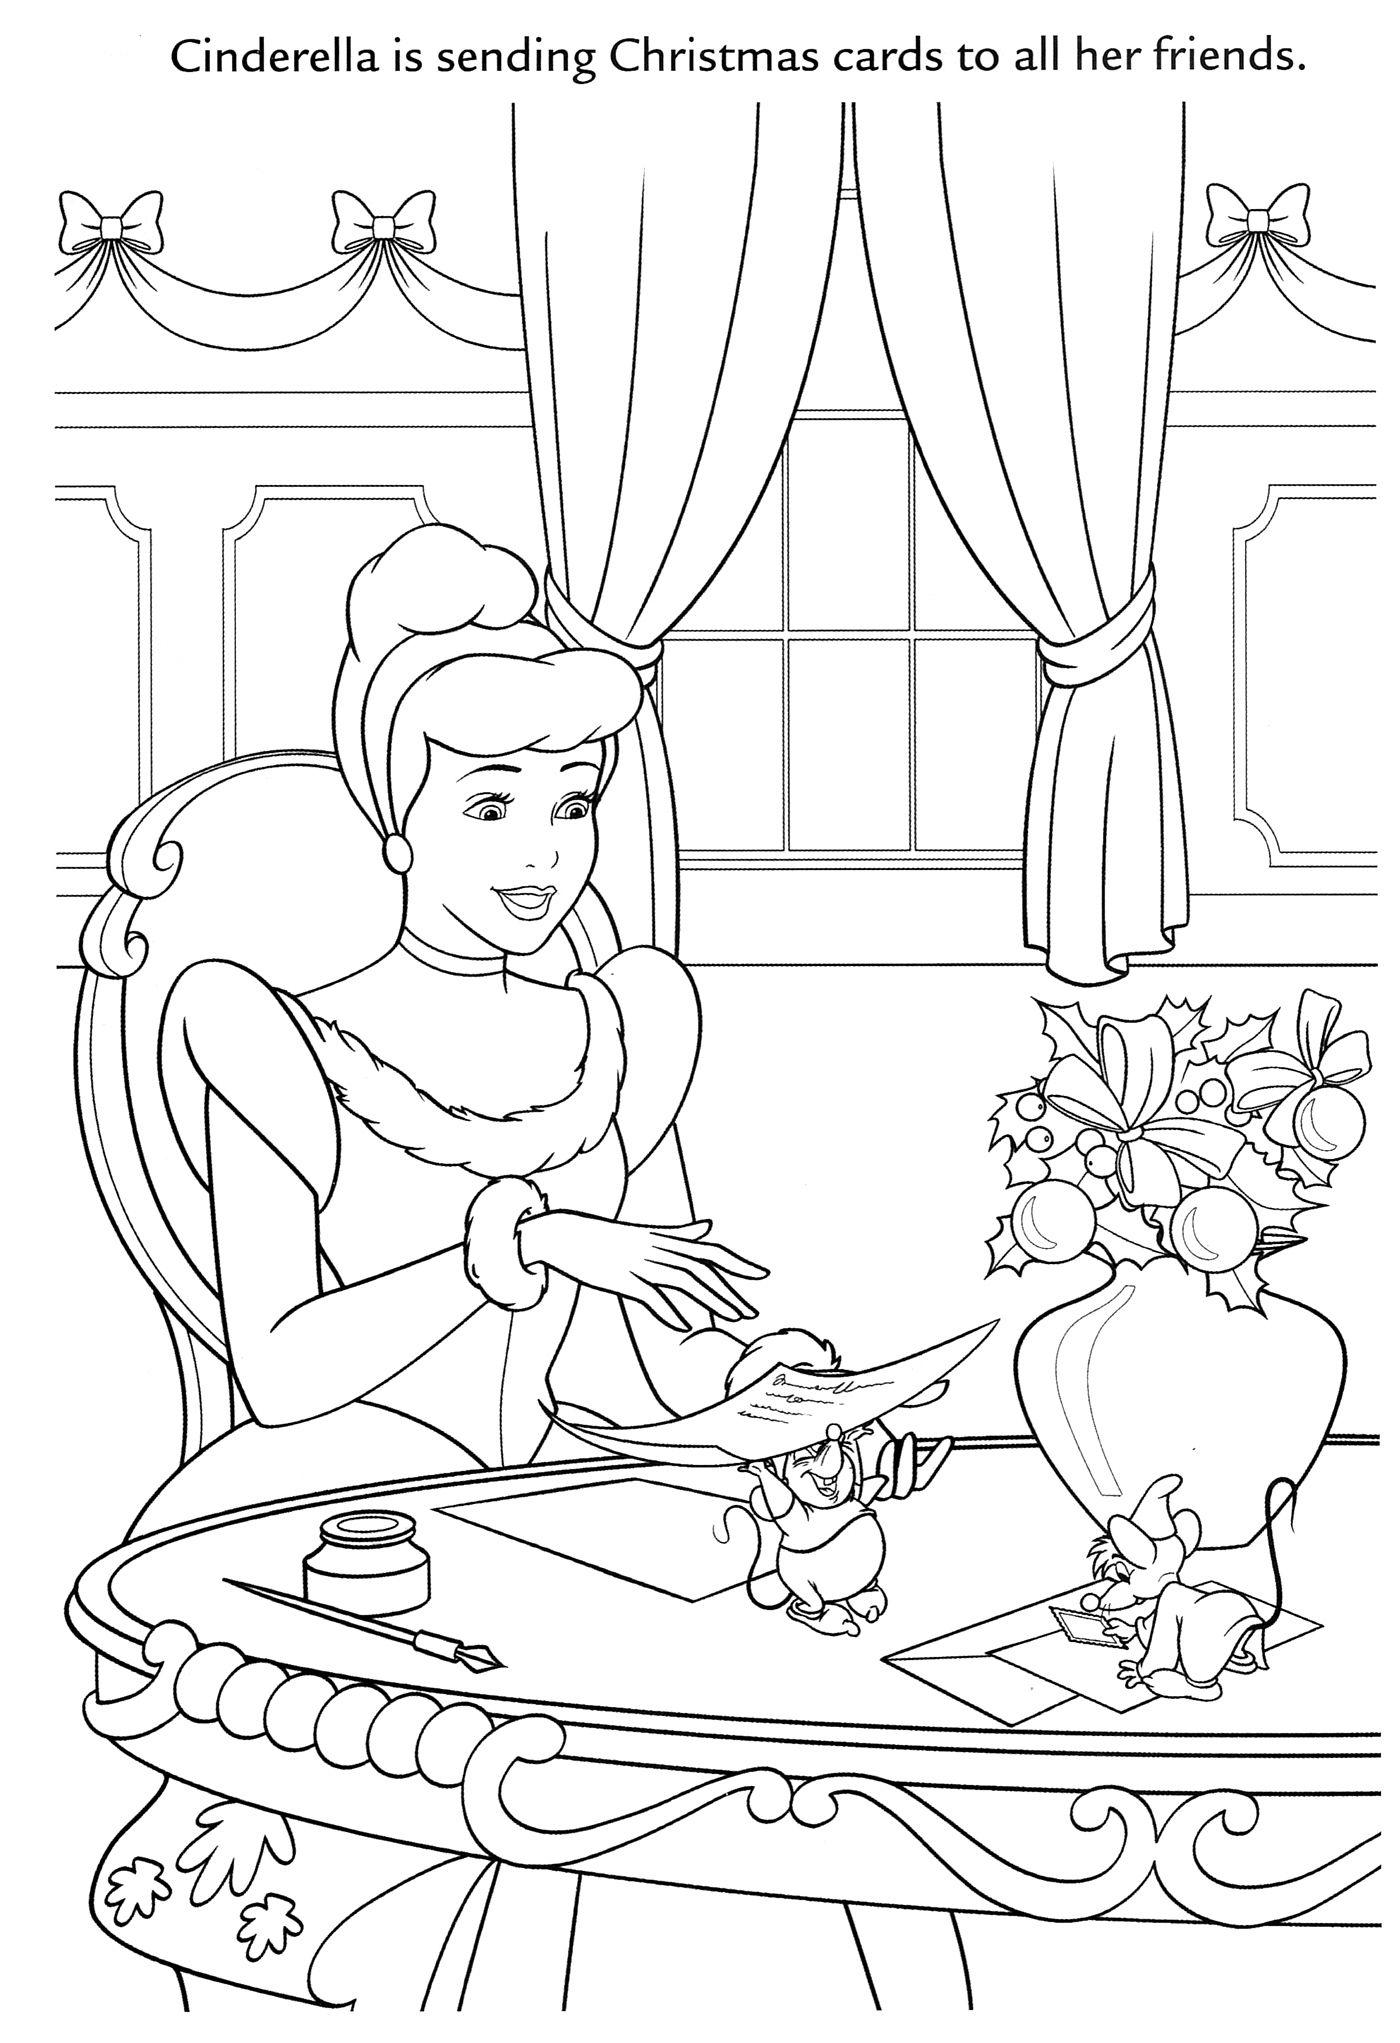 http://www.oasidelleanime.com/minisiti/colorare/disney-princess ...